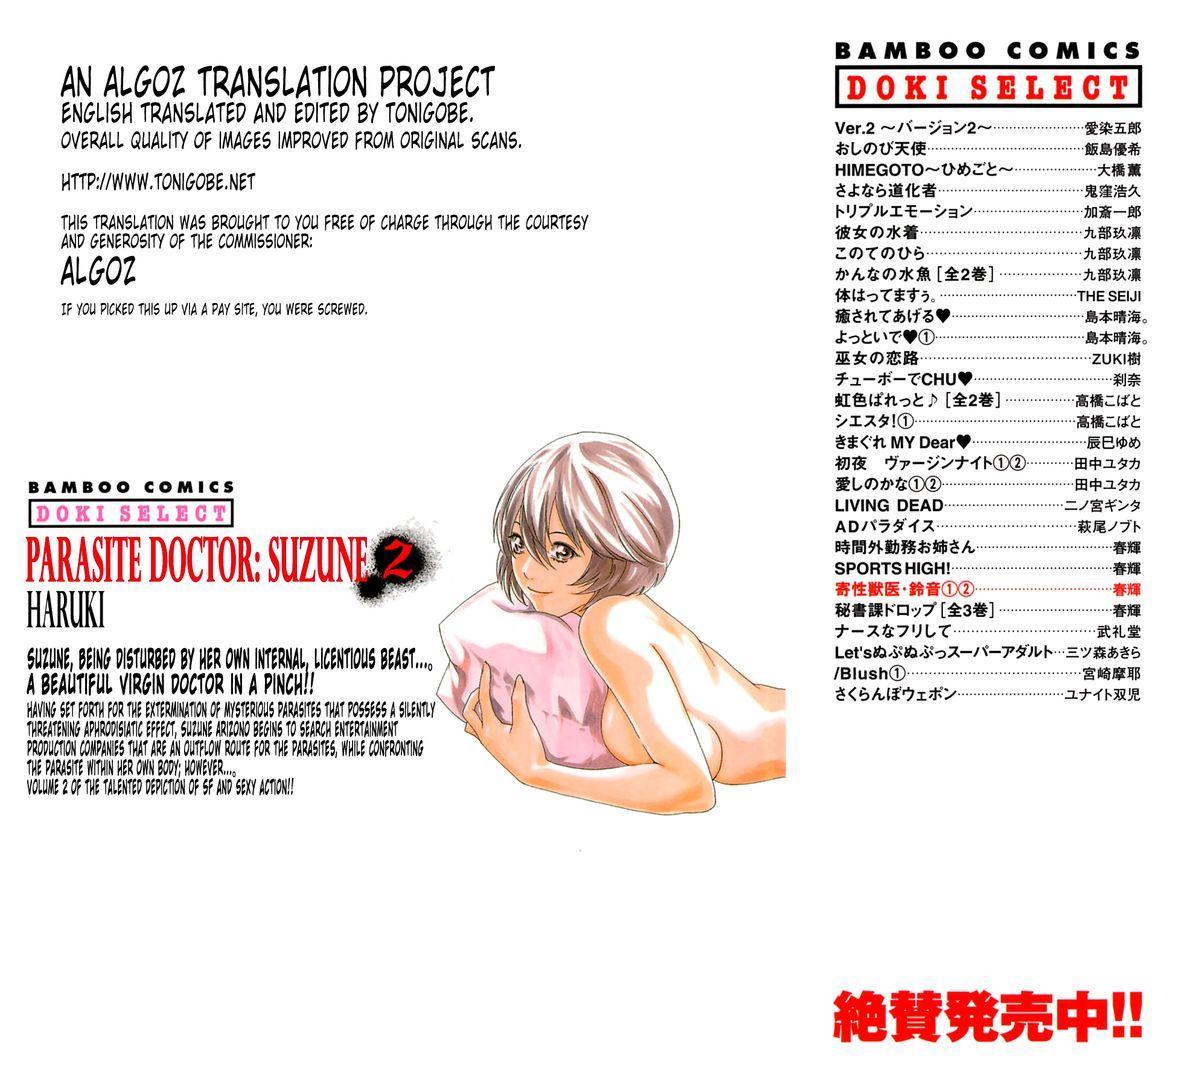 [Haruki] Kisei Juui Suzune (Parasite Doctor Suzune) Vol.02 - CH10-11 1